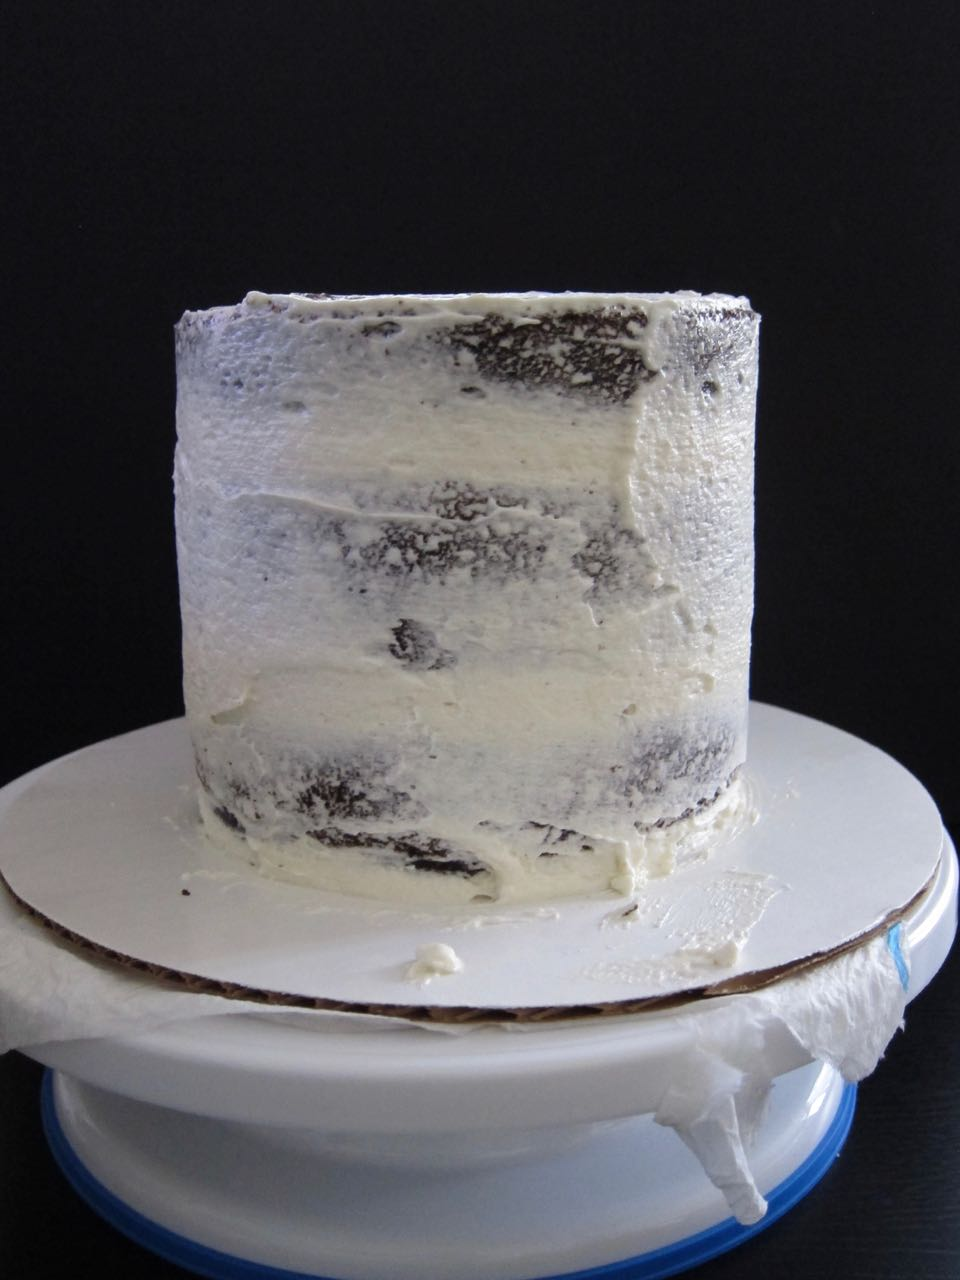 crumb coat cake layers.jpg